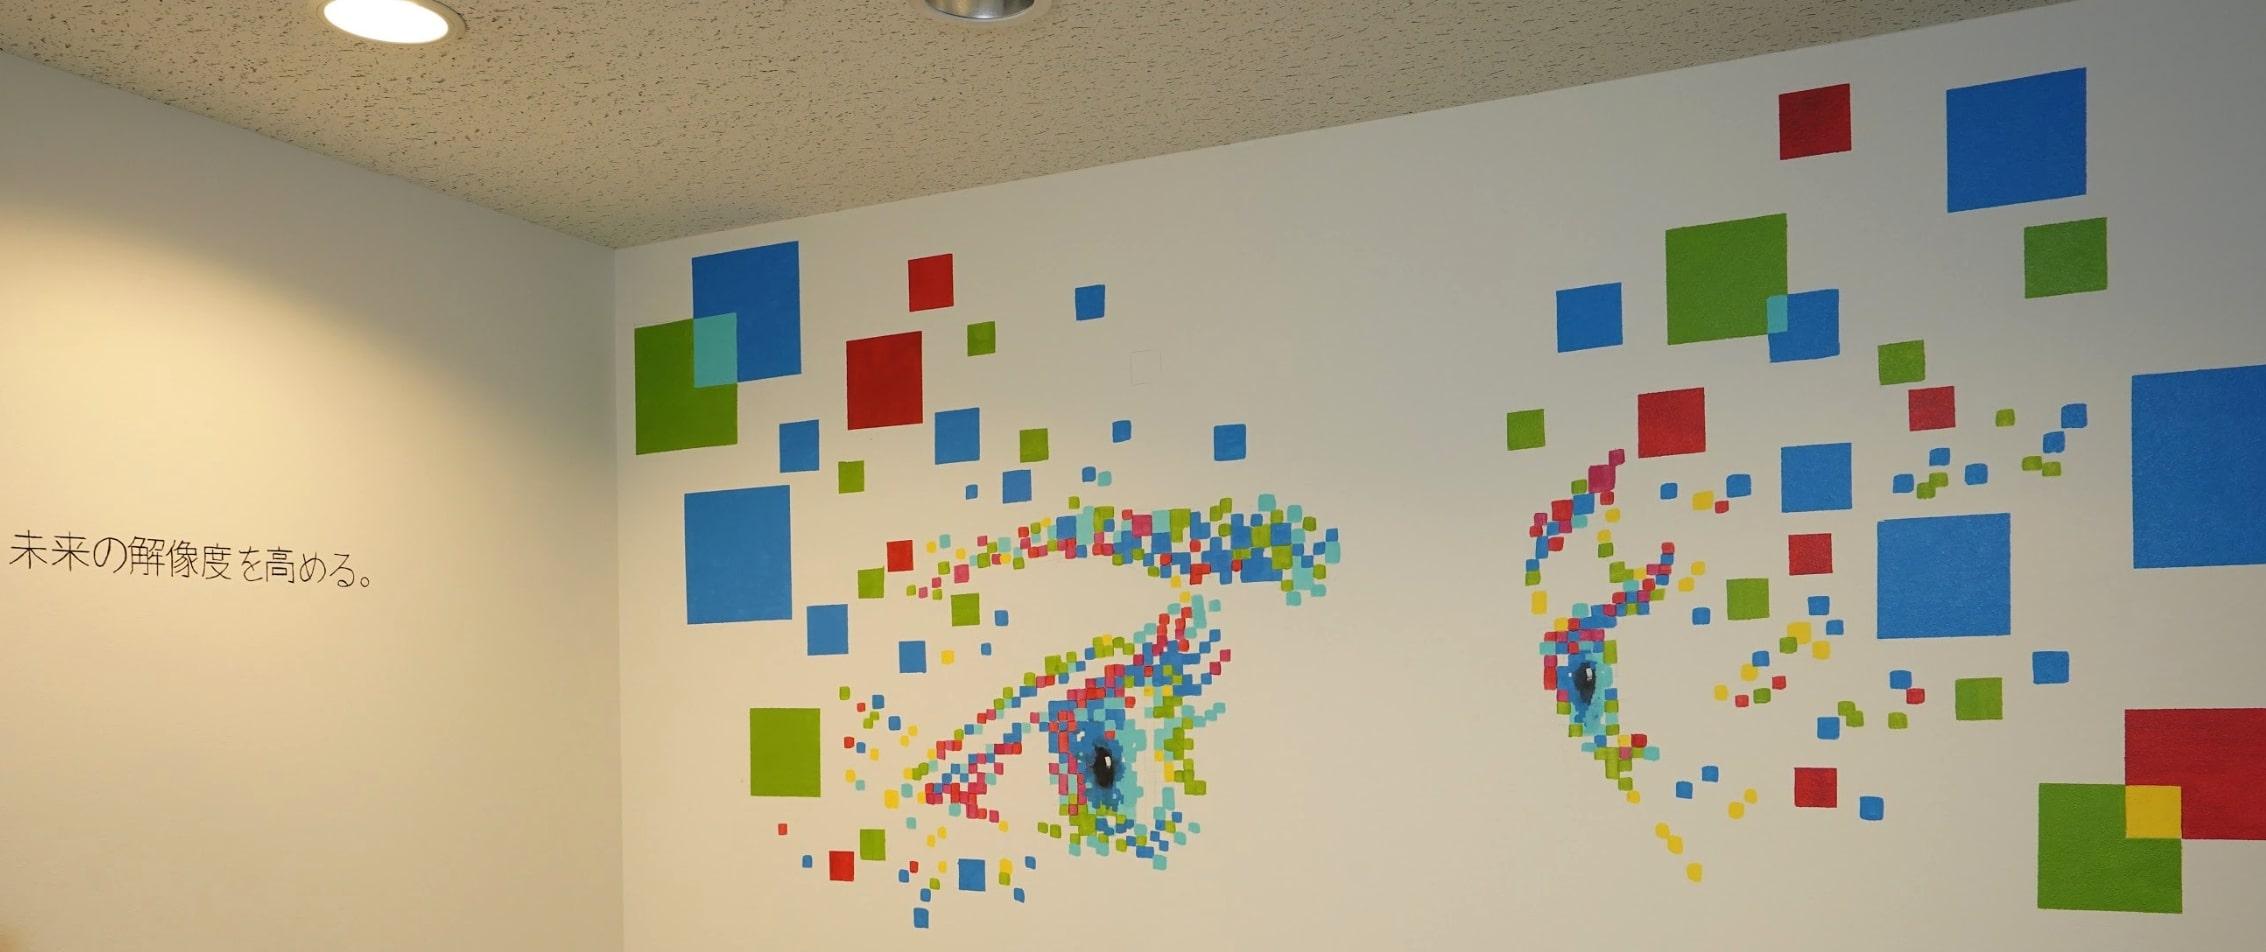 image from 第1会議室「未来の解像度を高める。」